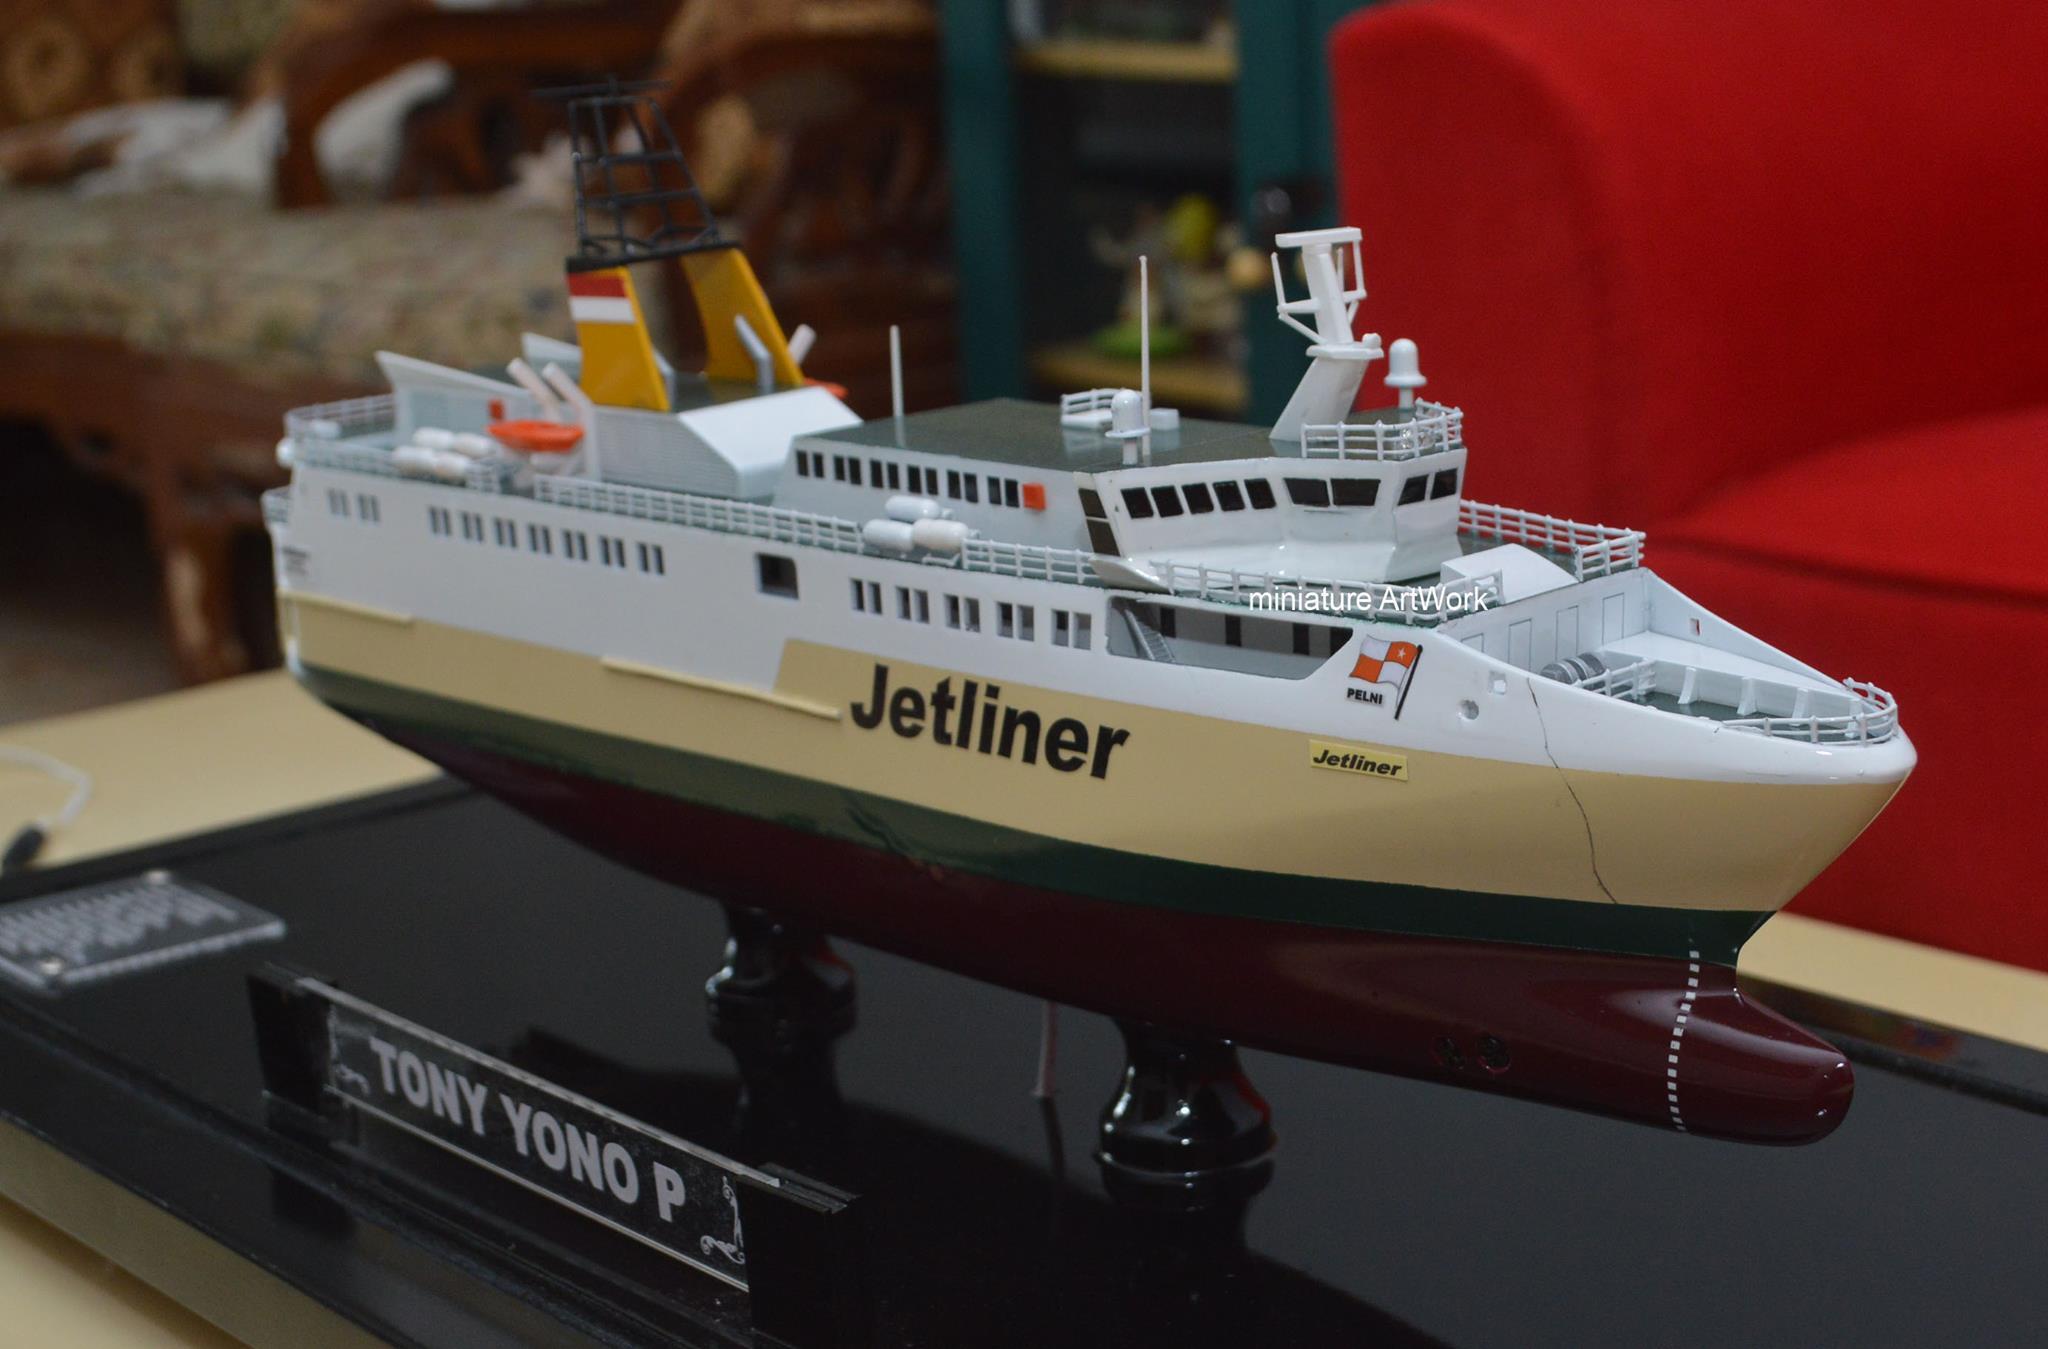 miniatur kapal kfc jetliner kapal ferry cepat milik pelni rumpun artwork planet kapal jakarta surabaya temanggung indonesia